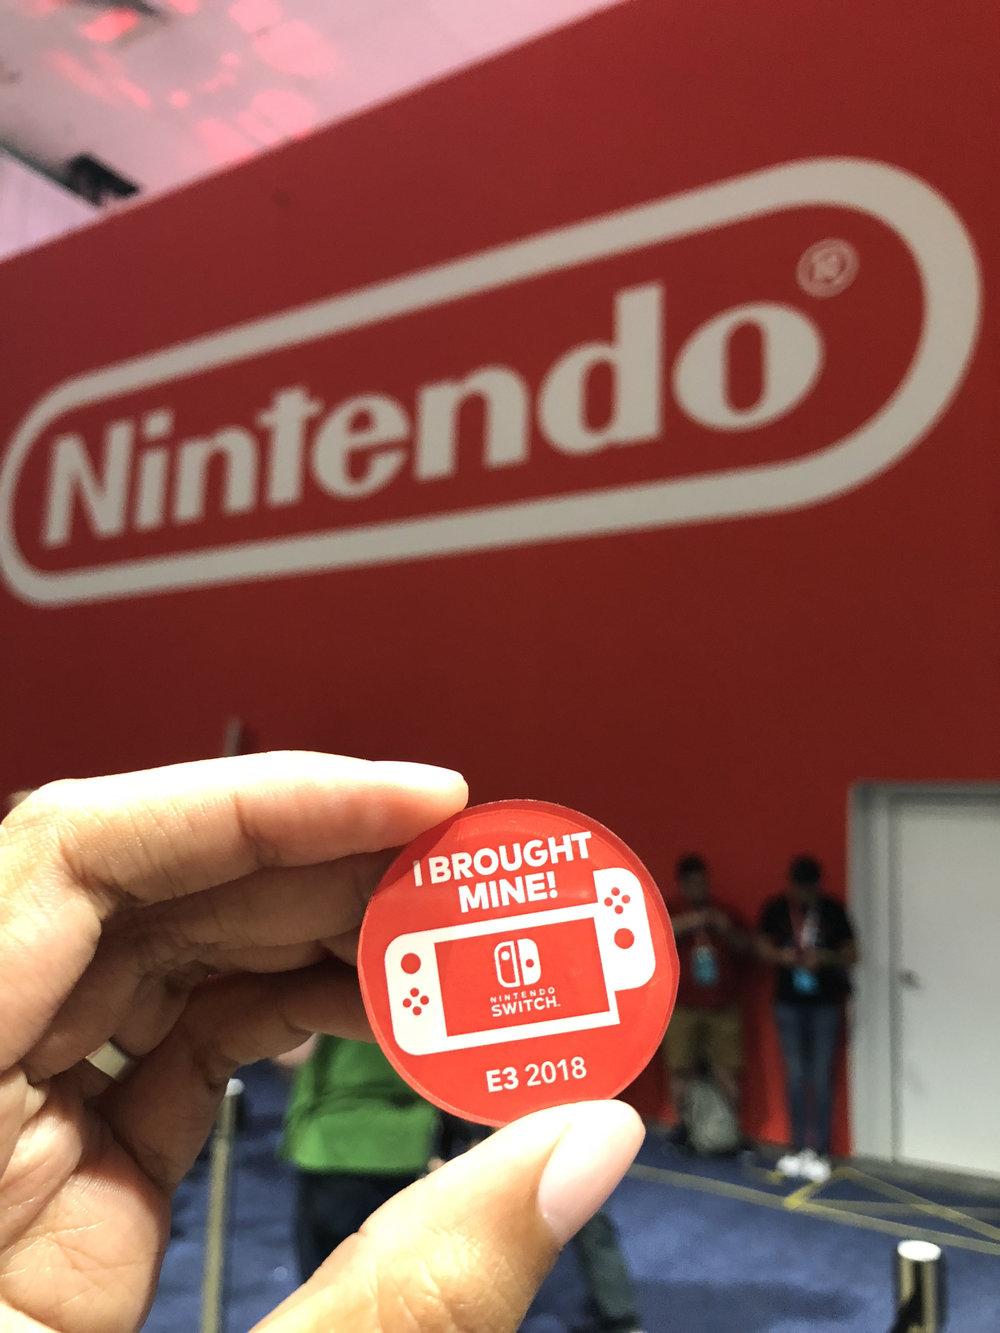 Nintendopin.jpg